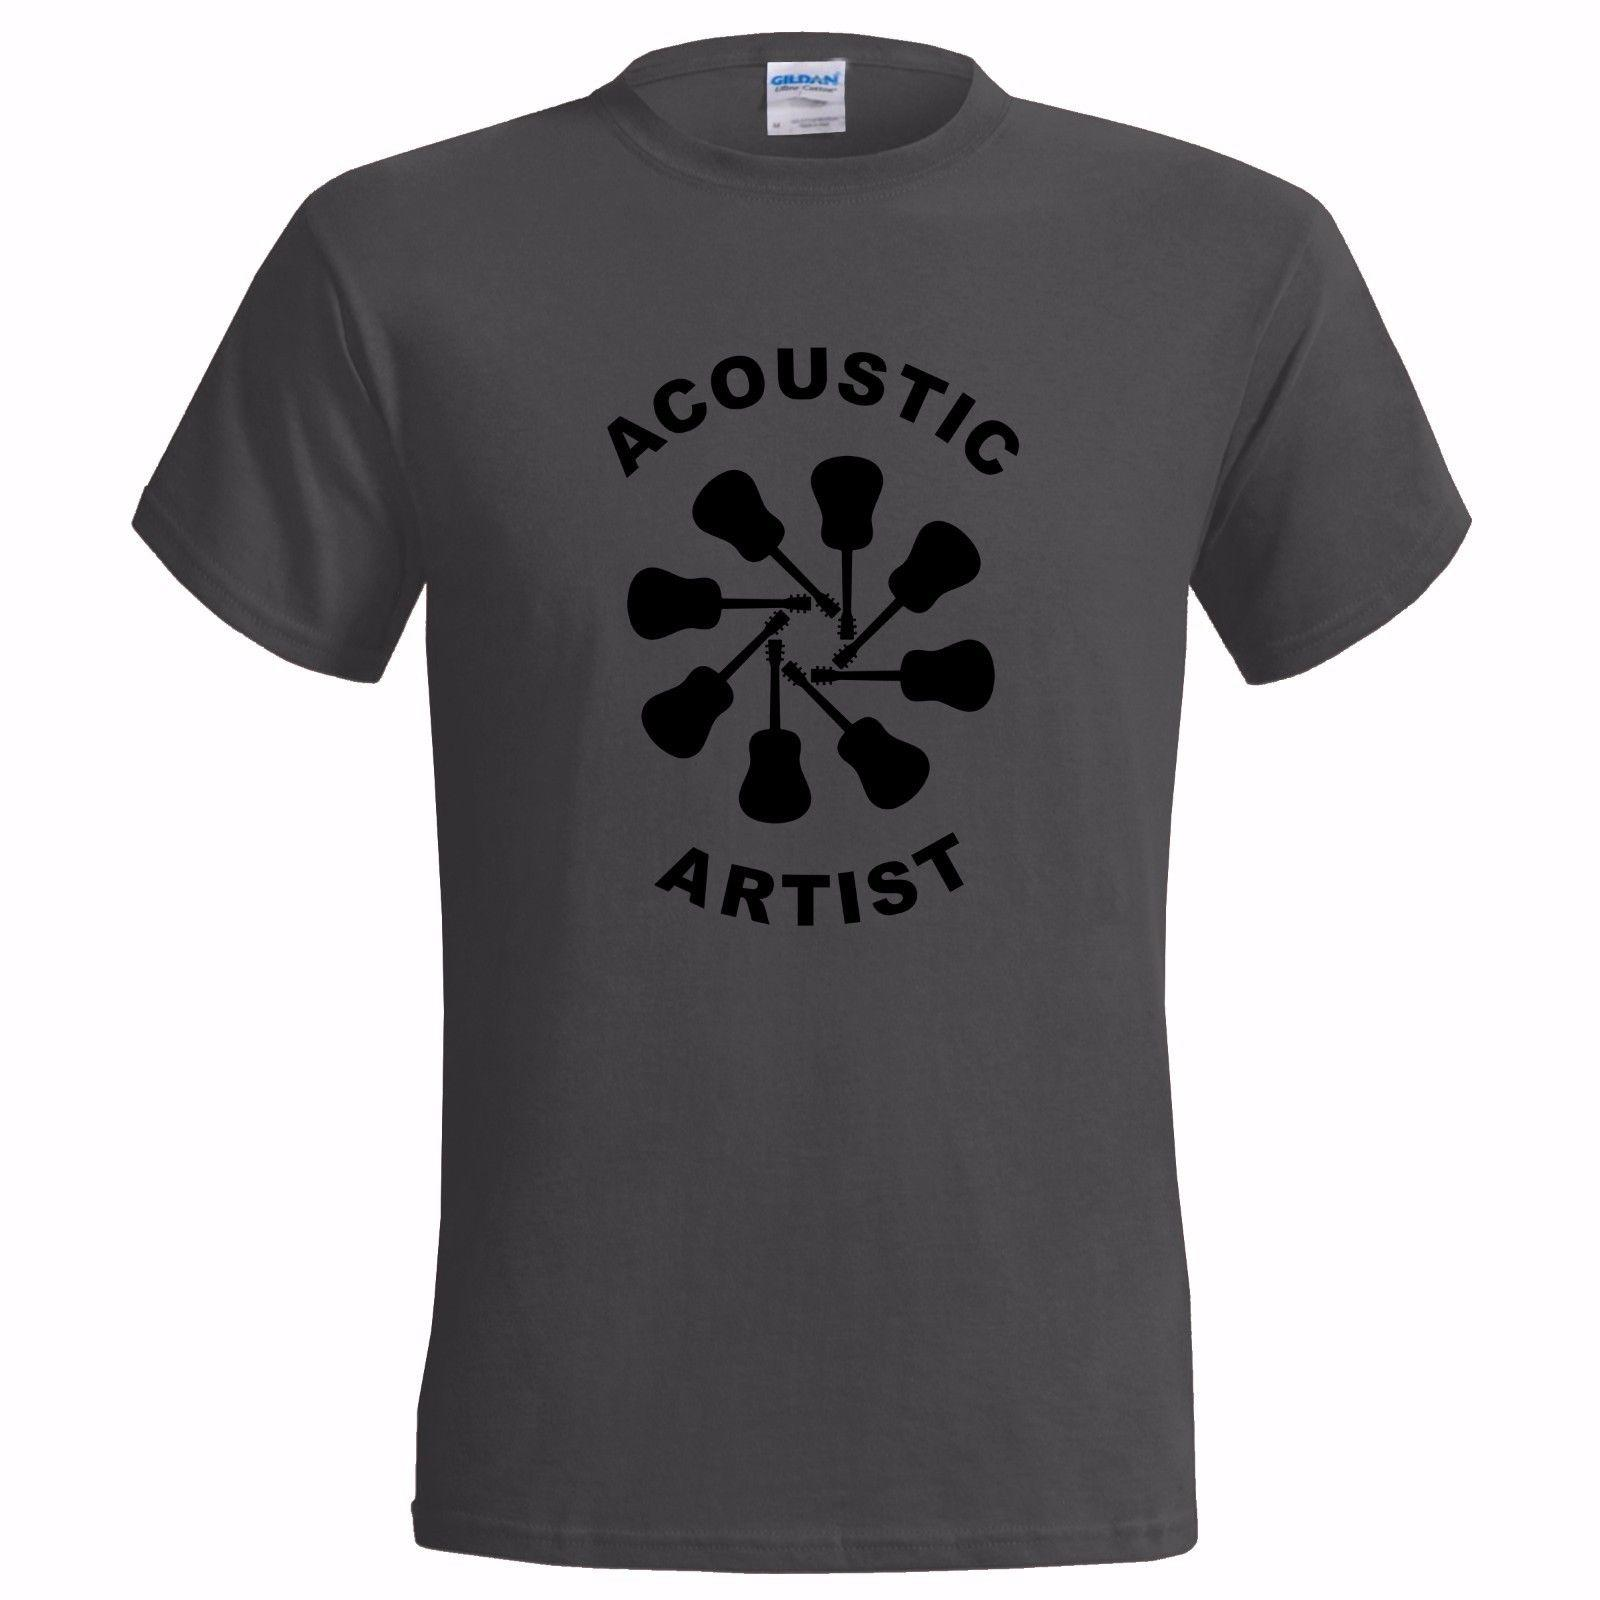 best sale top-rated cheap usa cheap sale ACOUSTIC ARTIST LOGO DESIGN MENS T SHIRT GUITAR GUITARIST PLAYER TEACHER  MUSIC Classic Quality High T Shirt Shirt T Shirt Funny T Shirts Cheap From  ...